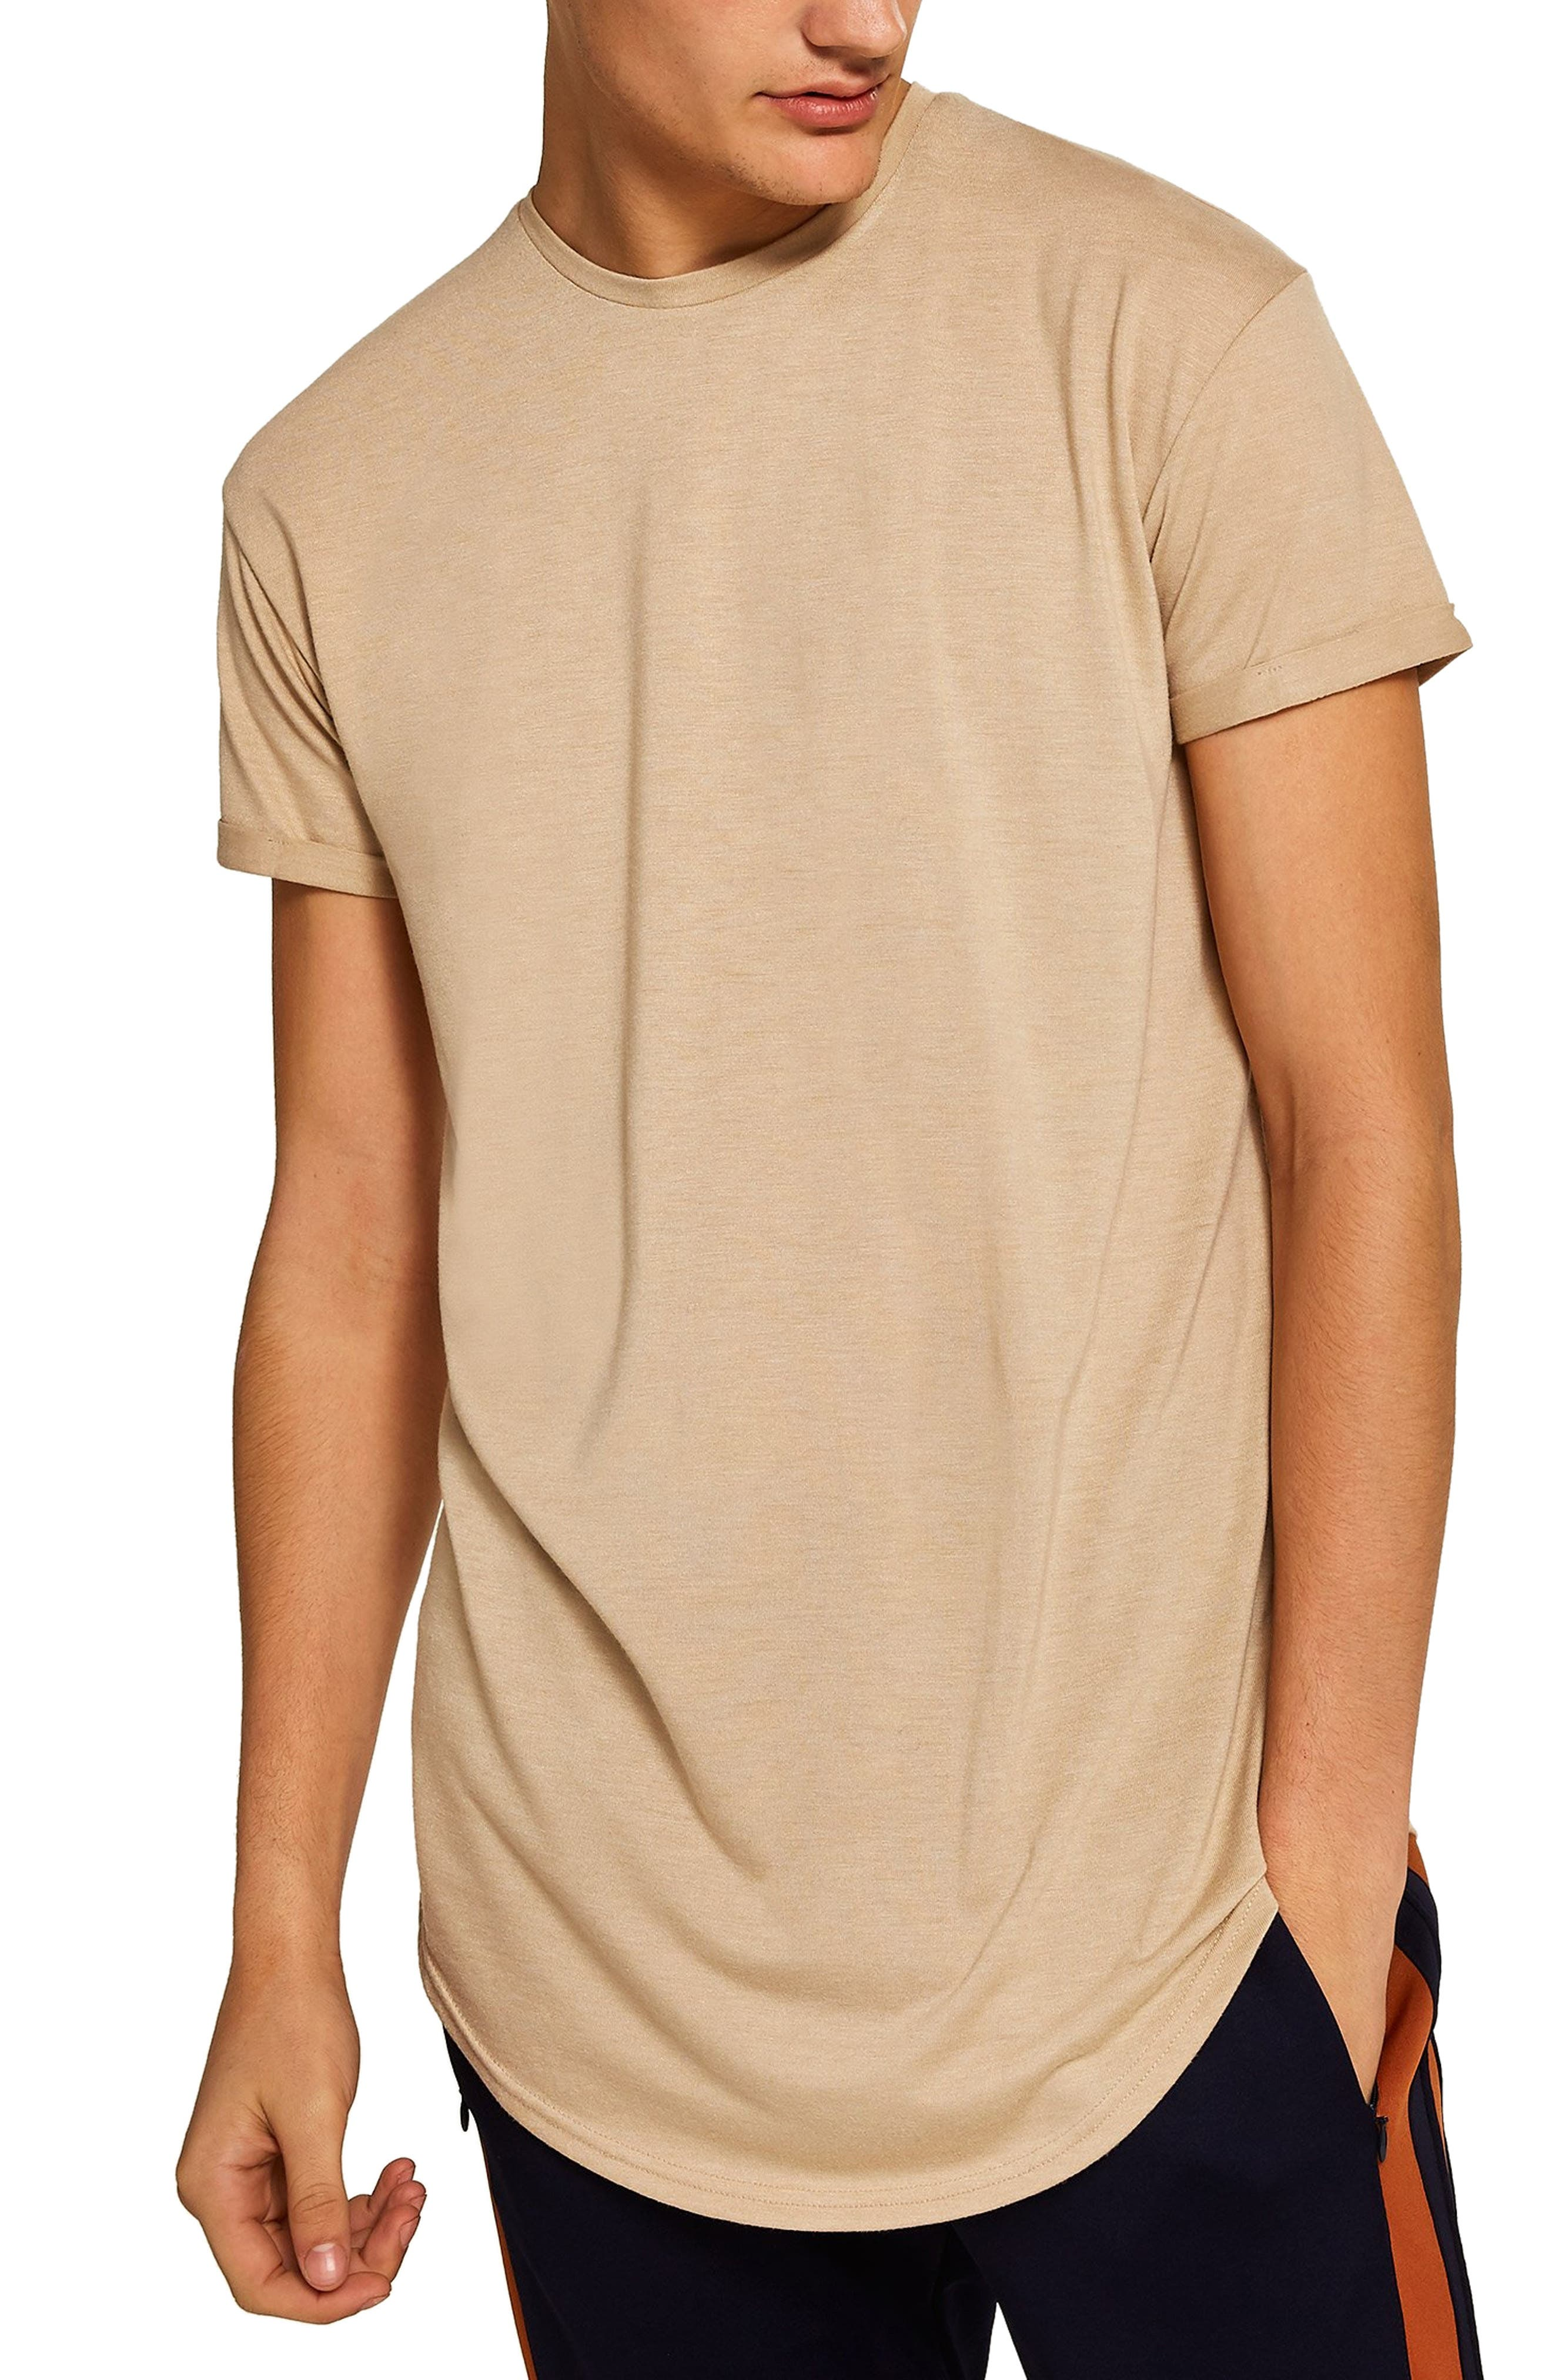 TOPMAN Scotty Longline T-Shirt, Main, color, STONE